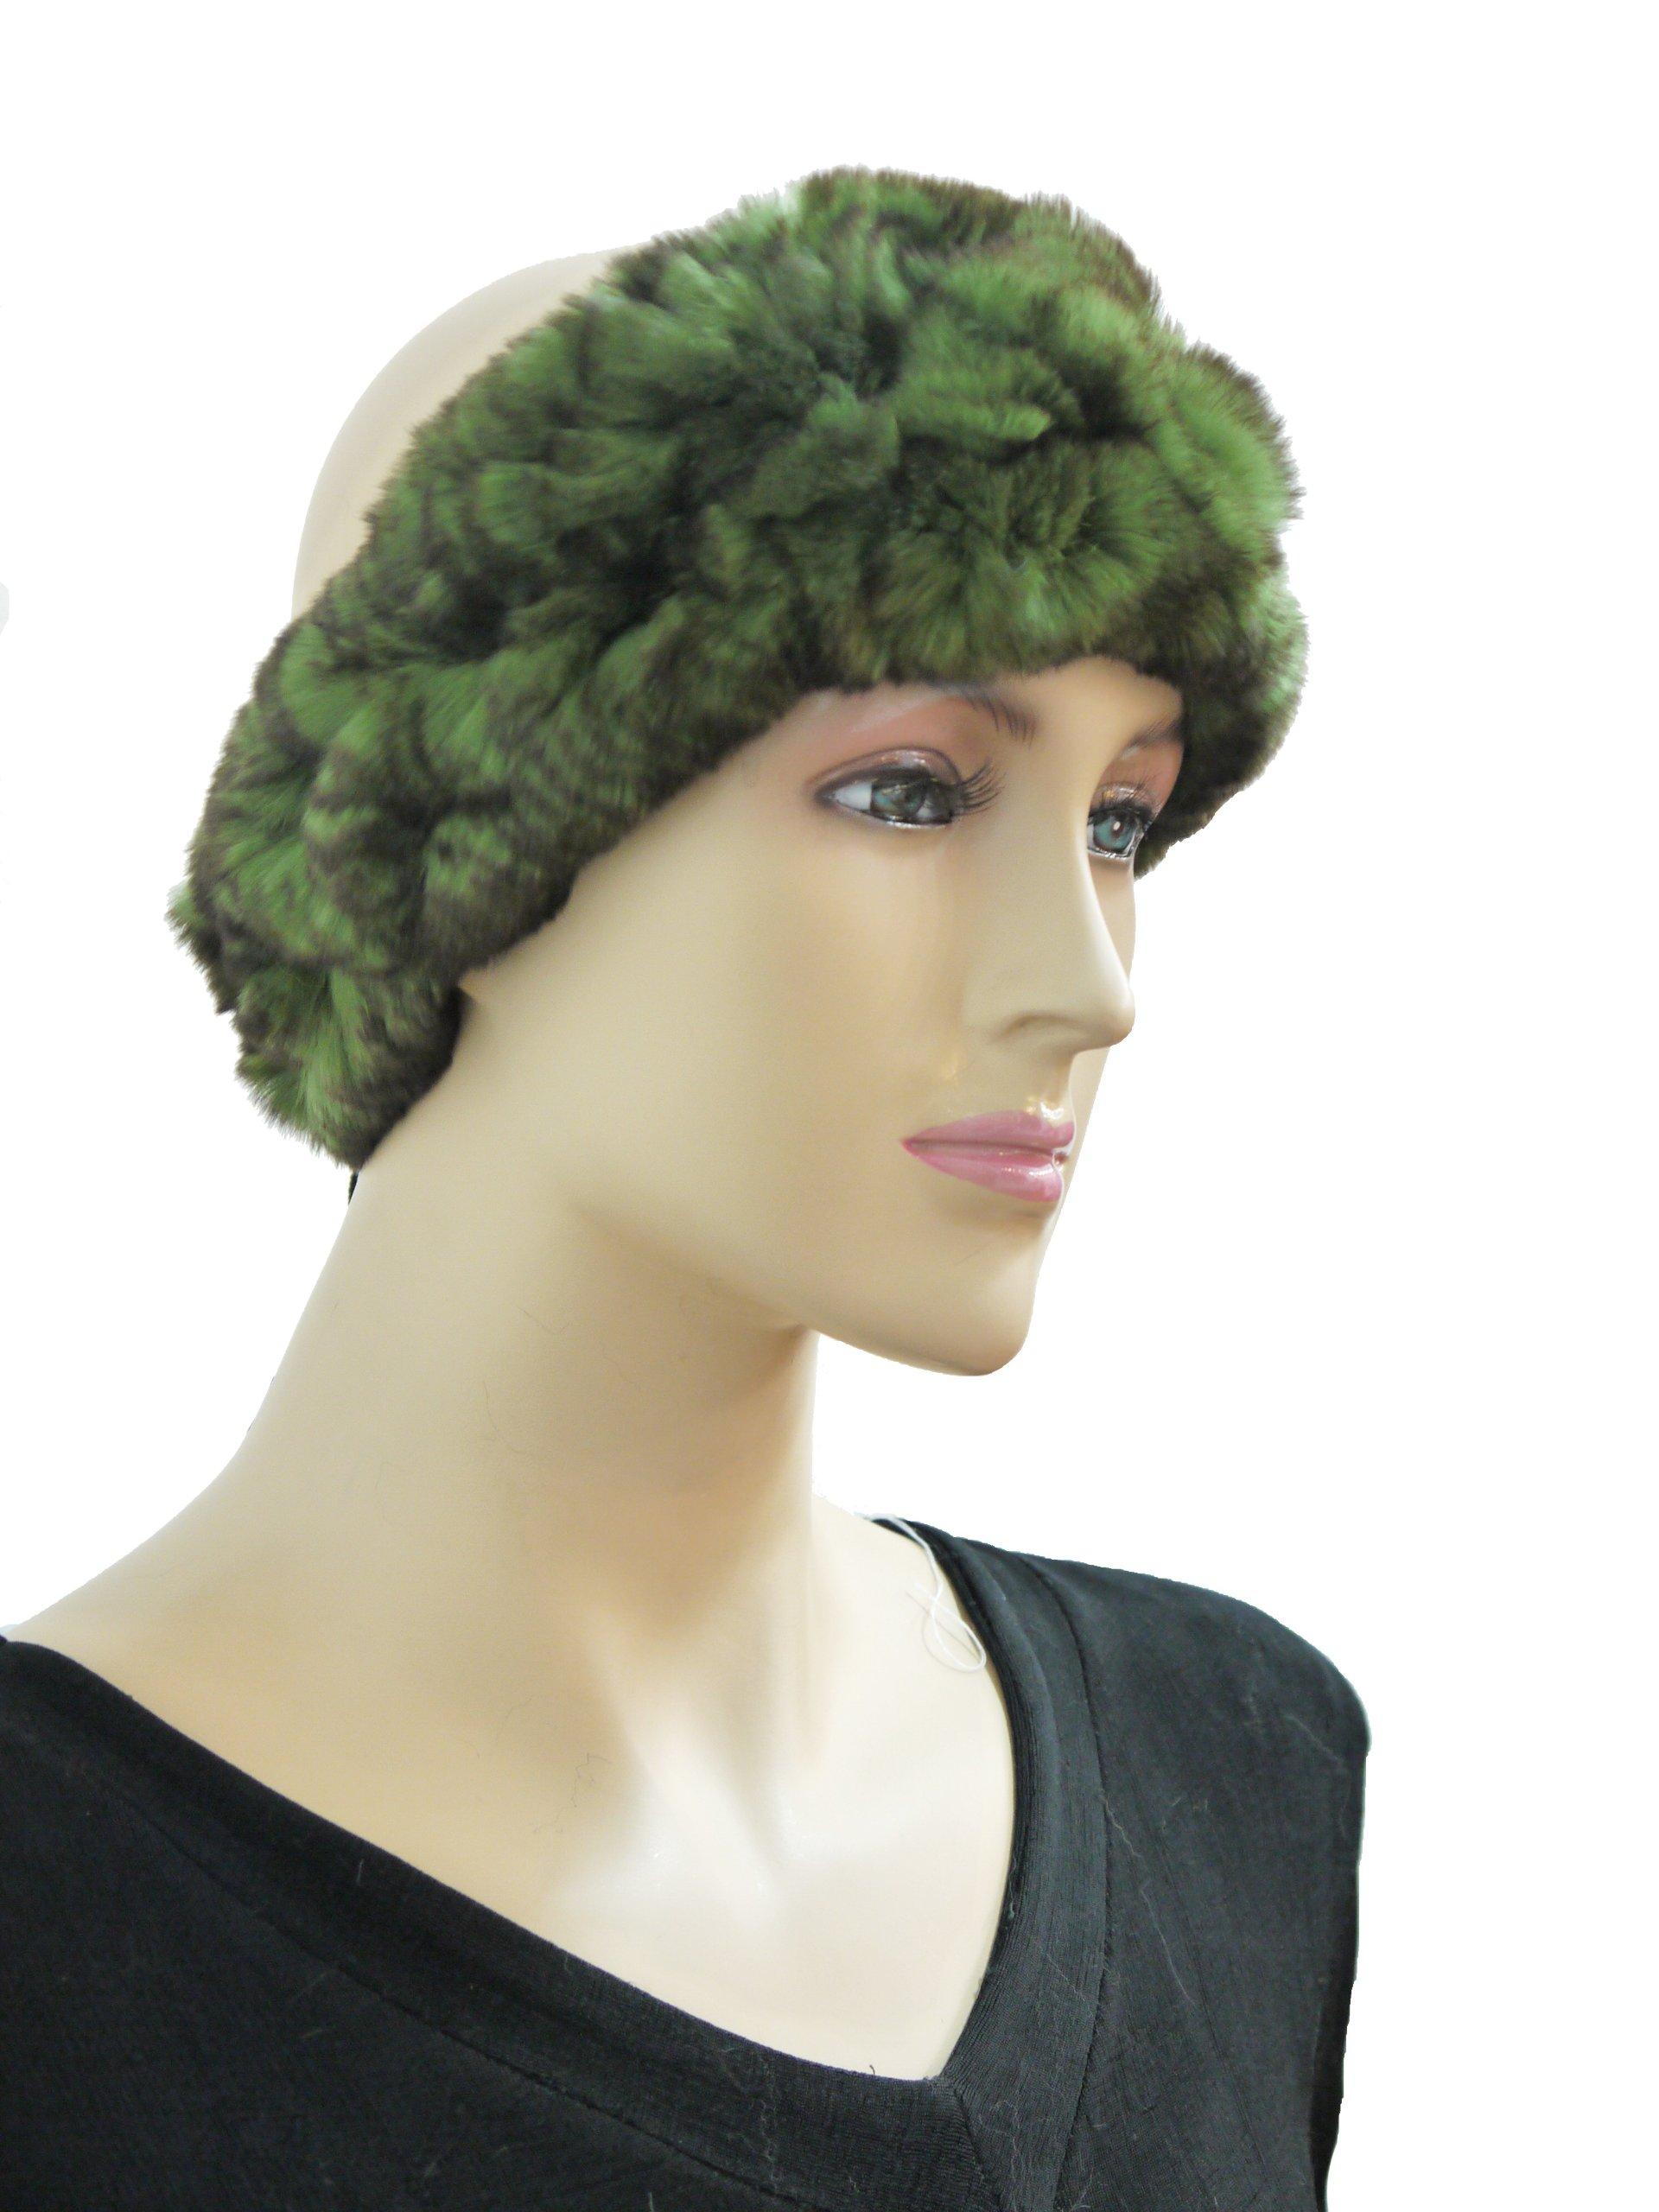 100% Rex Rabbit Fur Headband - Green Frosted